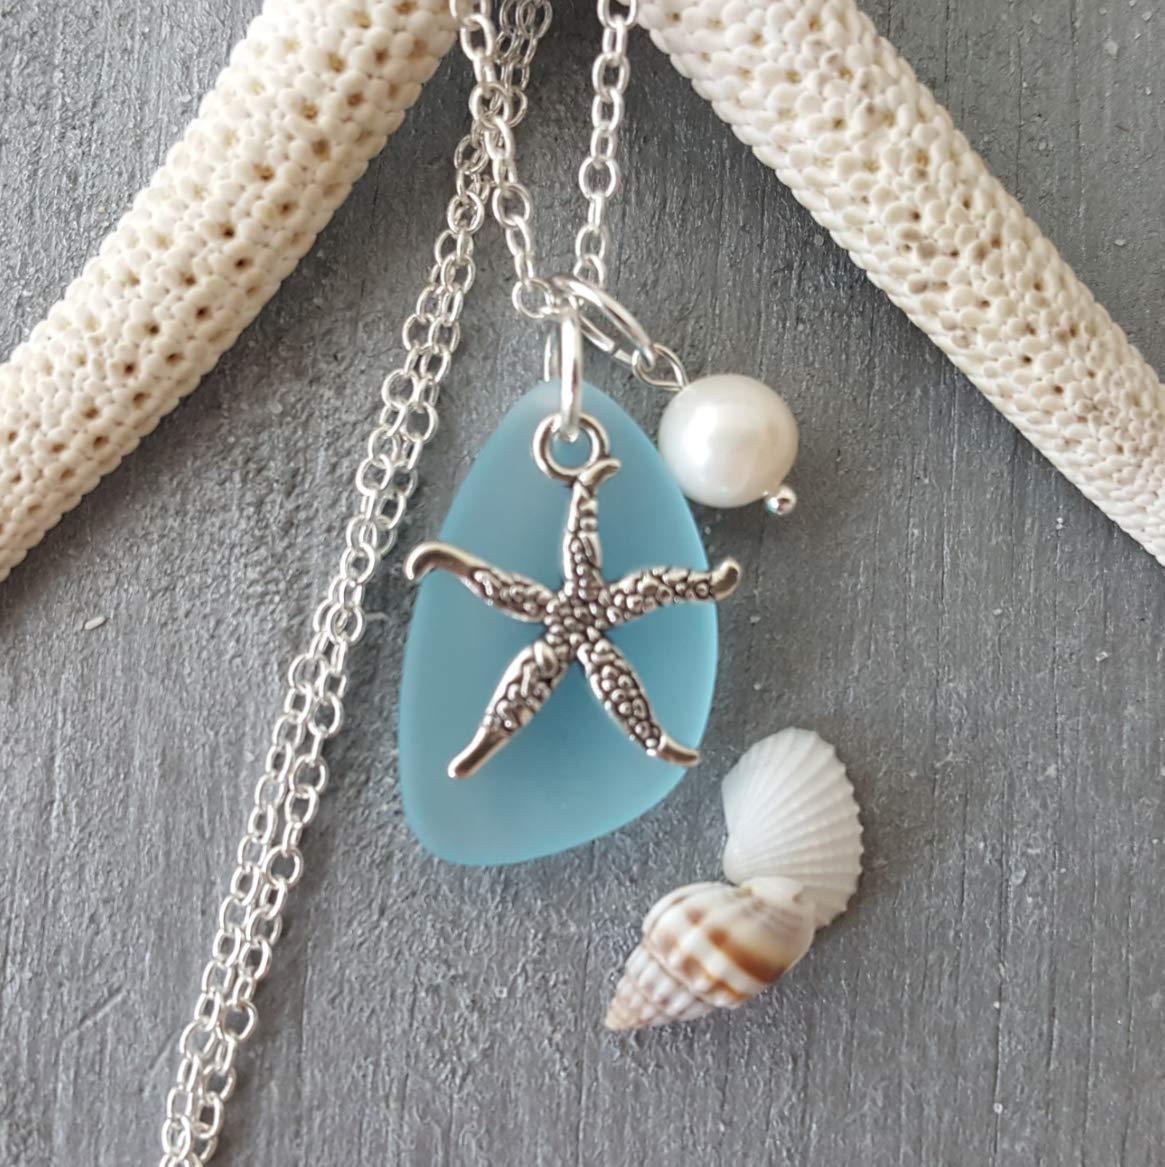 eb8e4f4214c23 Handmade in Hawaii, turquoise bay blue sea glass necklace,starfish  charm,freshwater pearl,